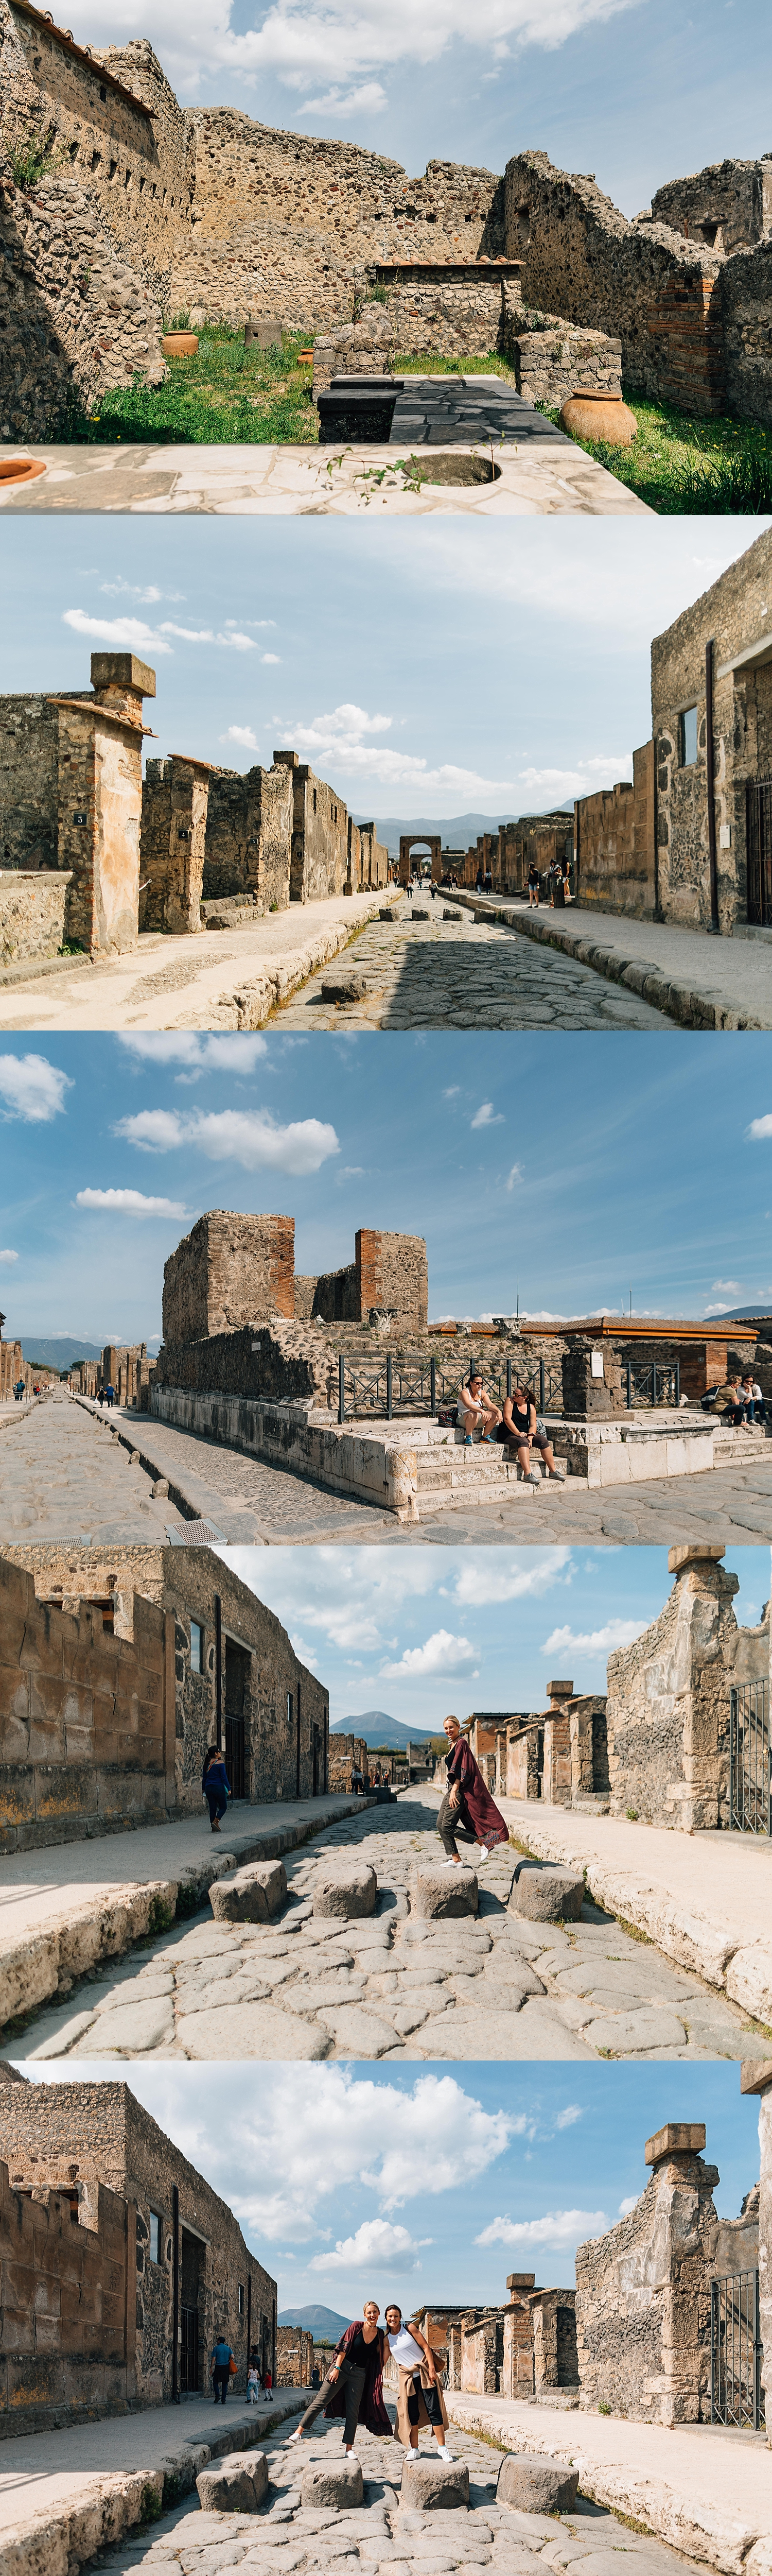 Stepping-stones at Pompeii